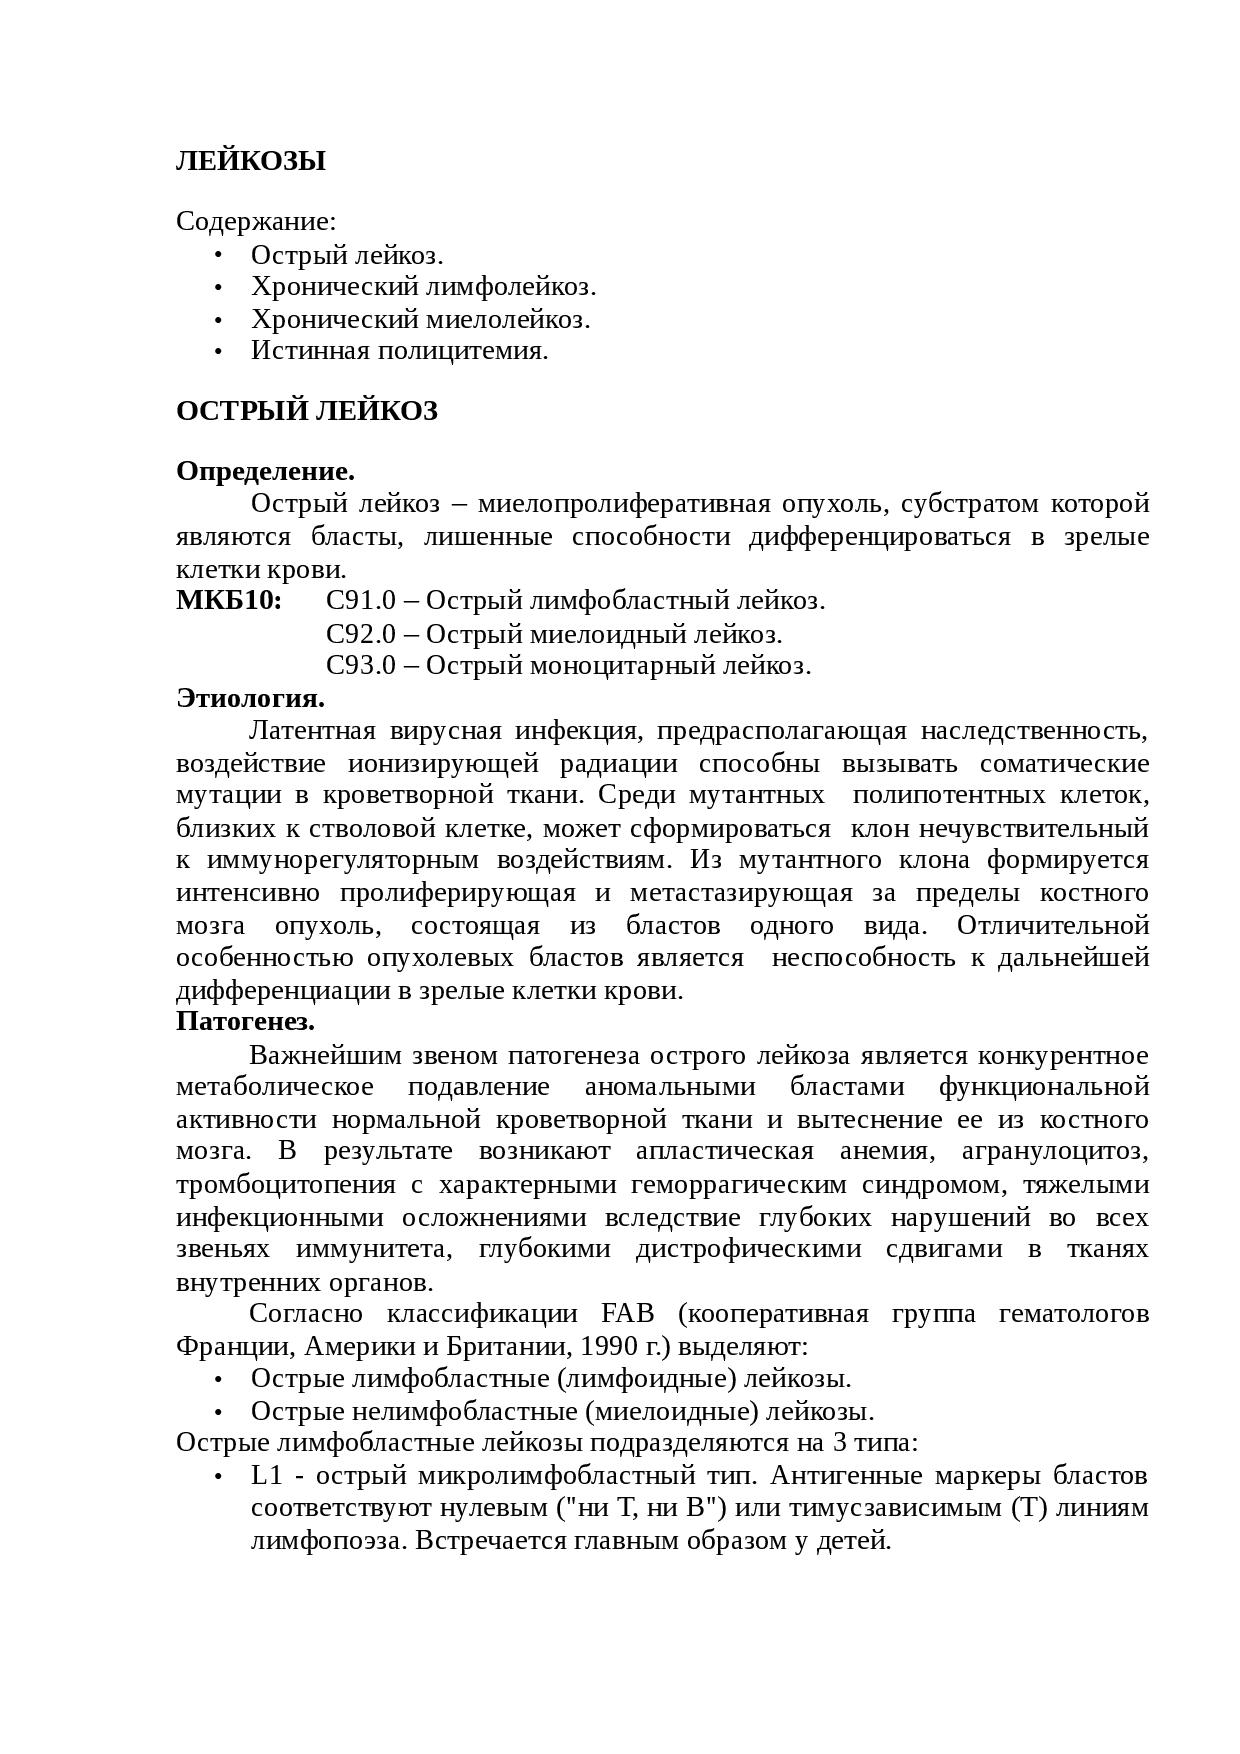 Лейкемия • ru.knowledgr.com